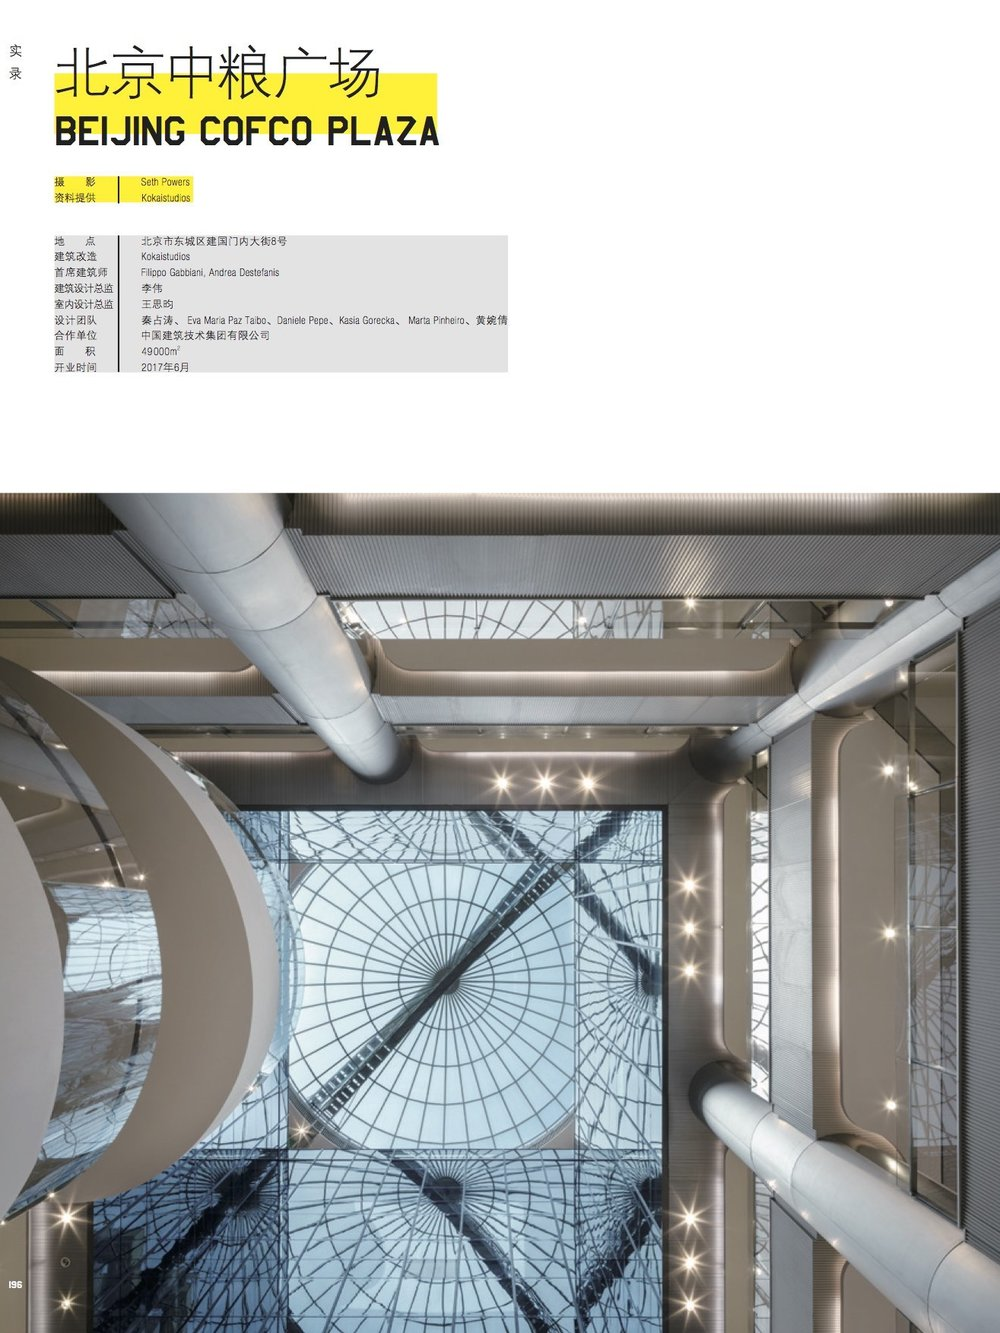 Interior Designer | Vol 66 March 2018 - Beijing COFCO Plaza /Kokaistudios